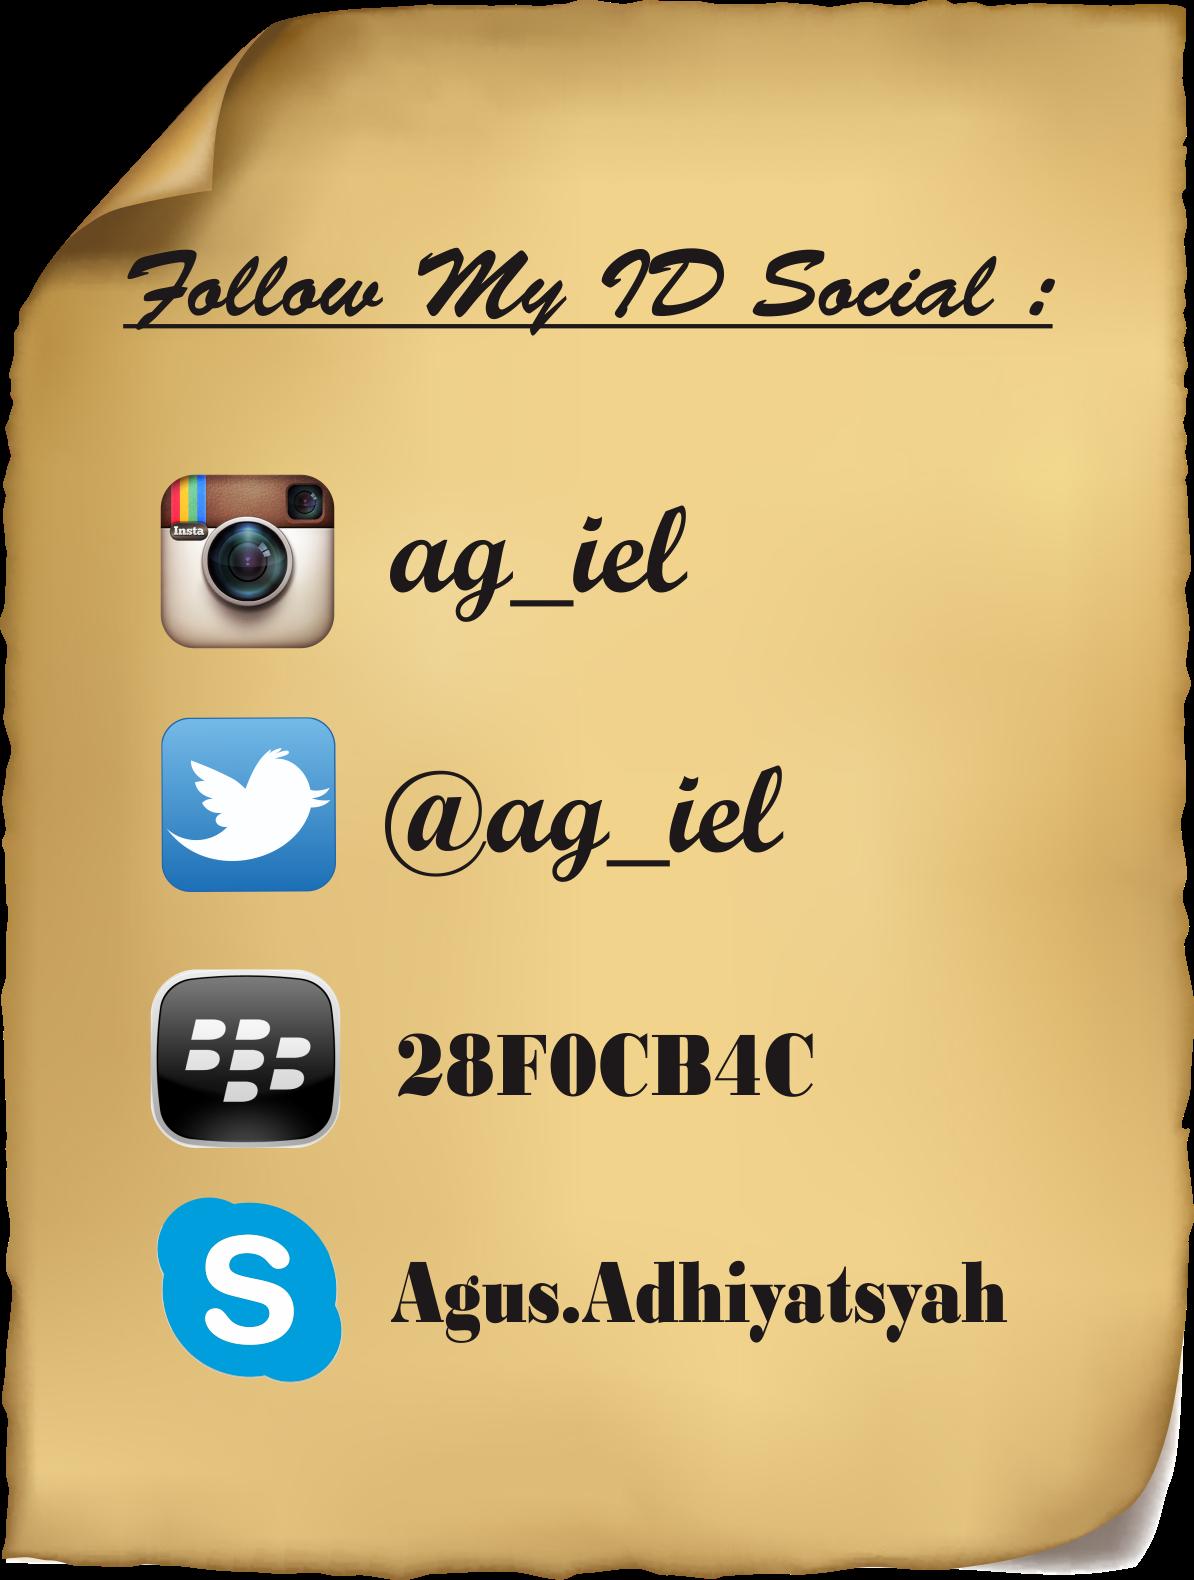 My ID Social